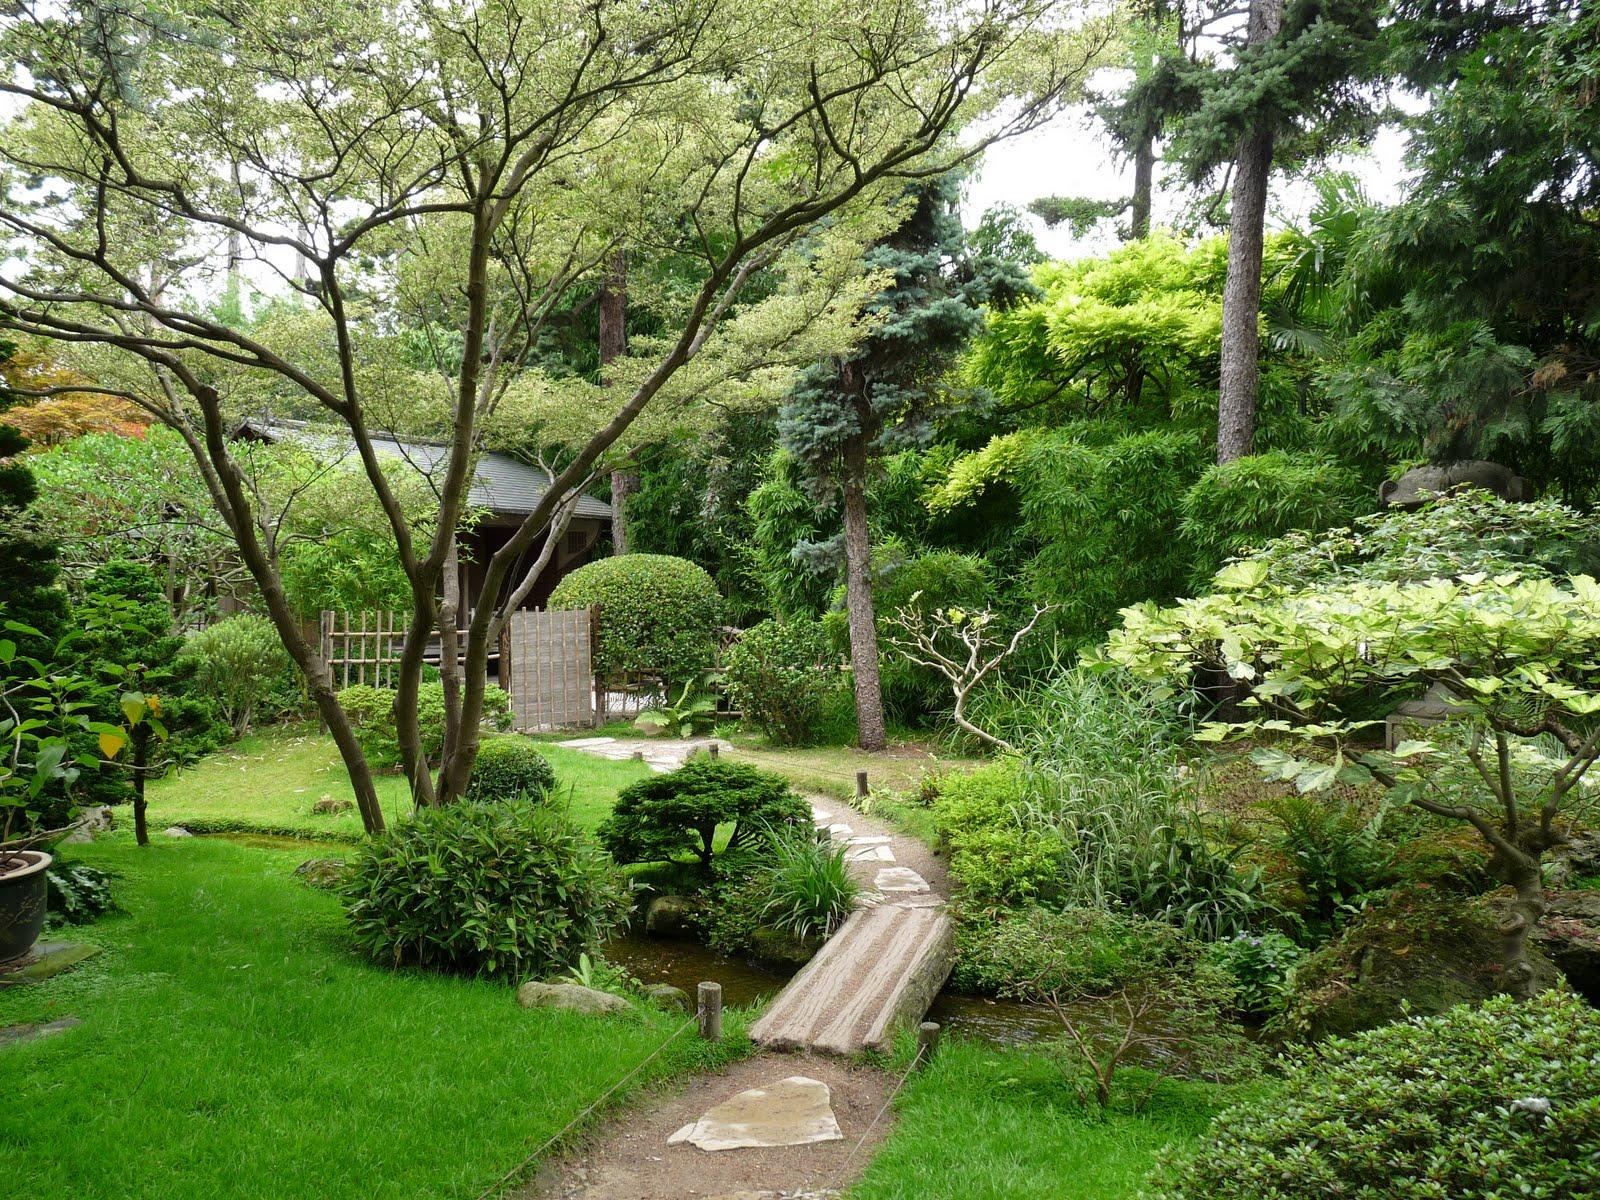 Mes autres carnets jardins albert kahn for Concevoir un jardin anglais